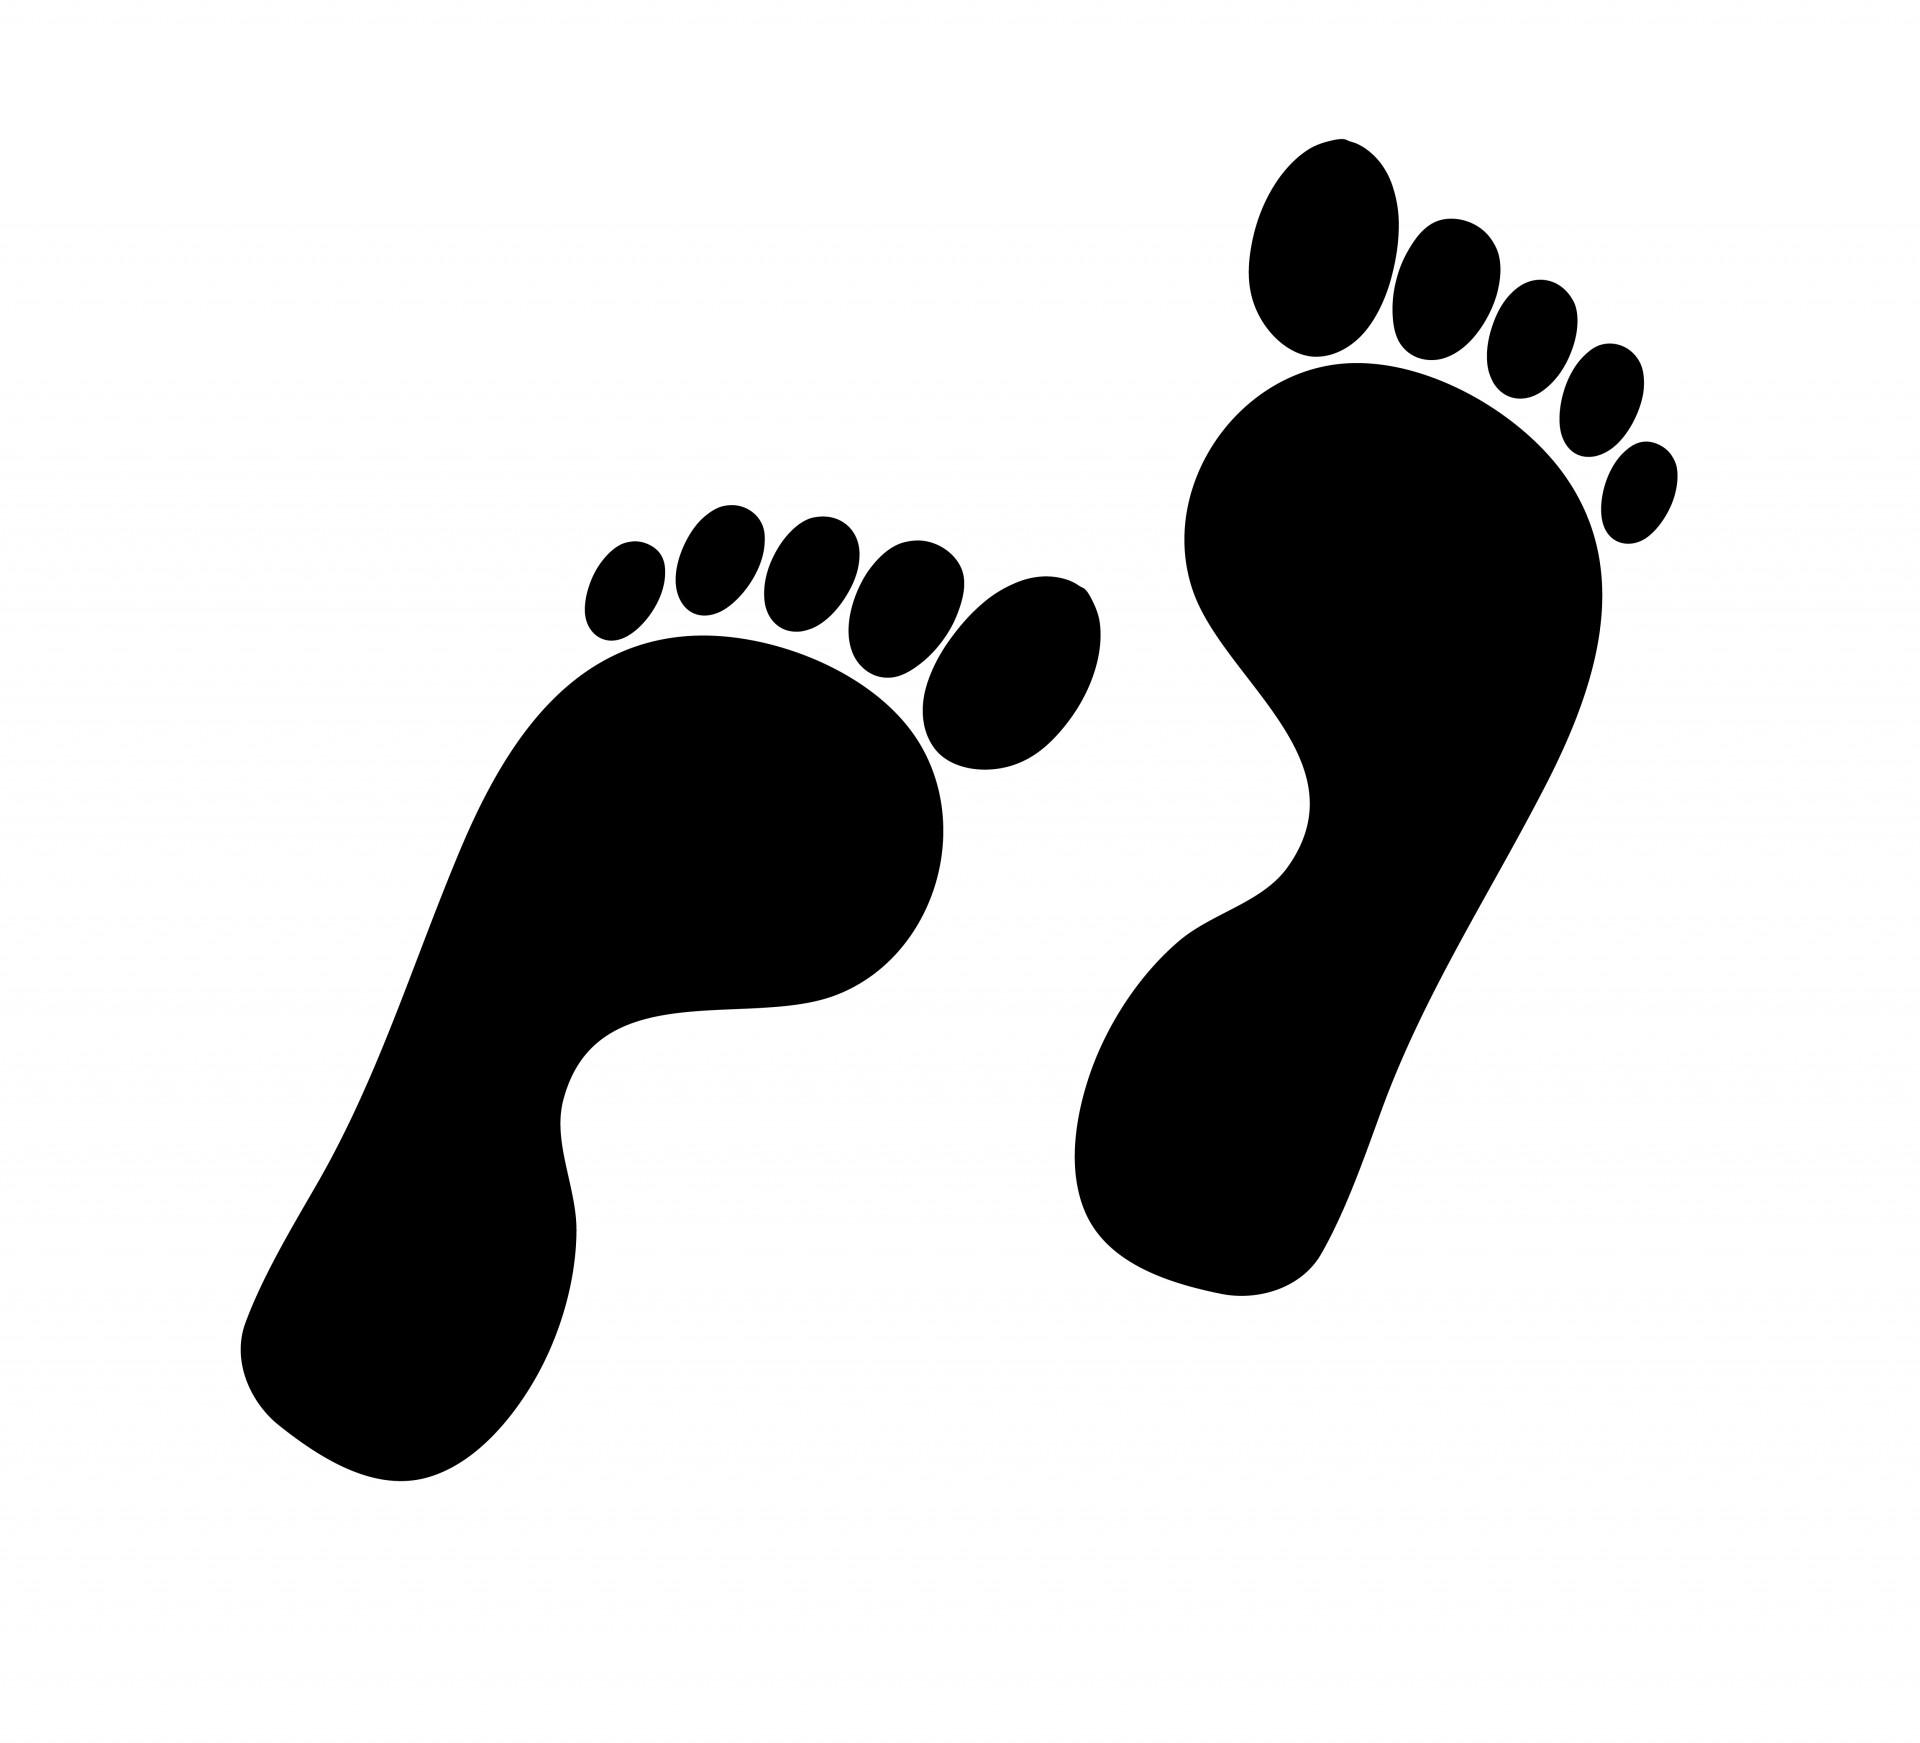 Footprint clipart Footprints Clip clipart ClipartMonk Images